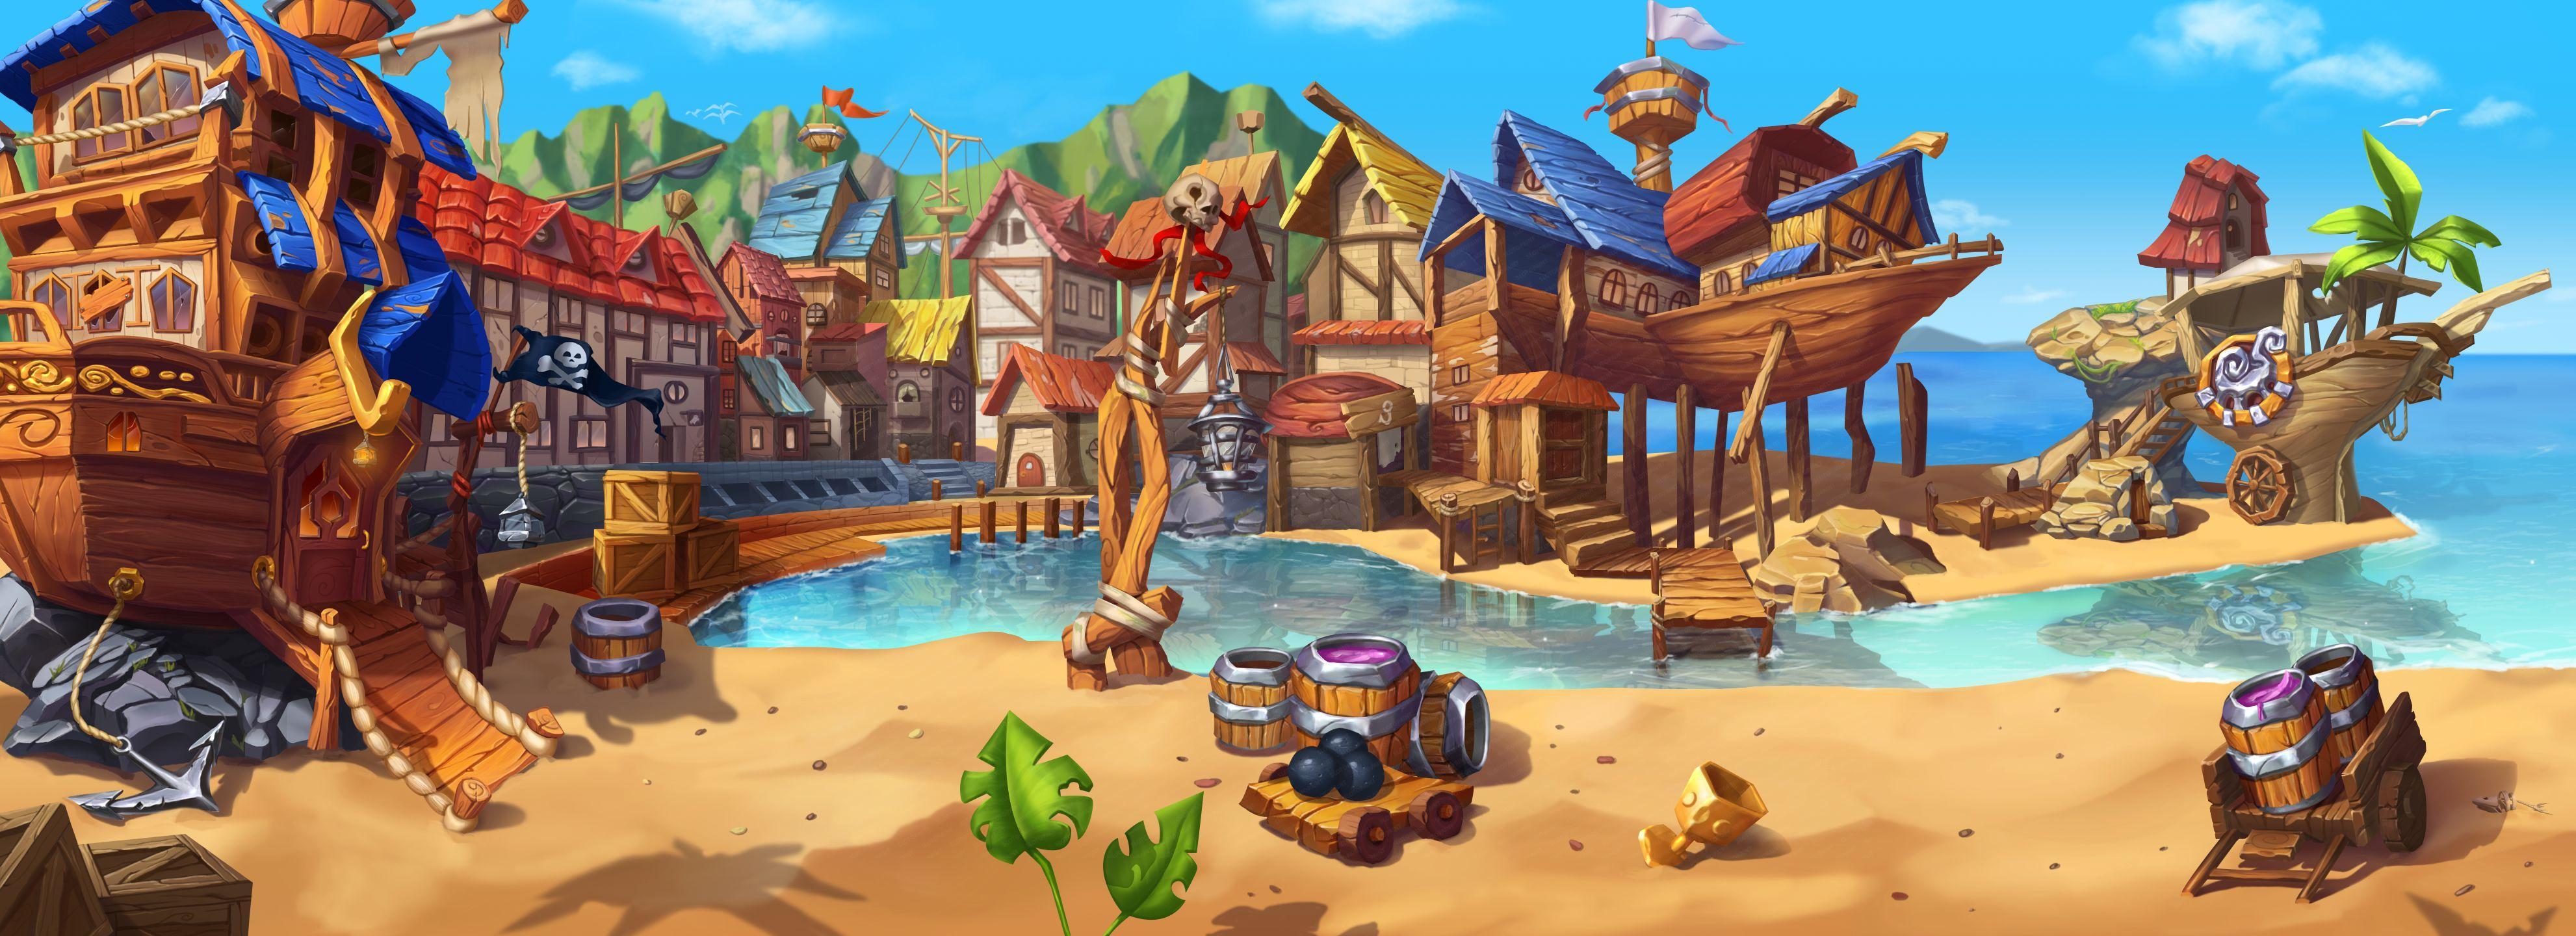 wildscreen_pirates1